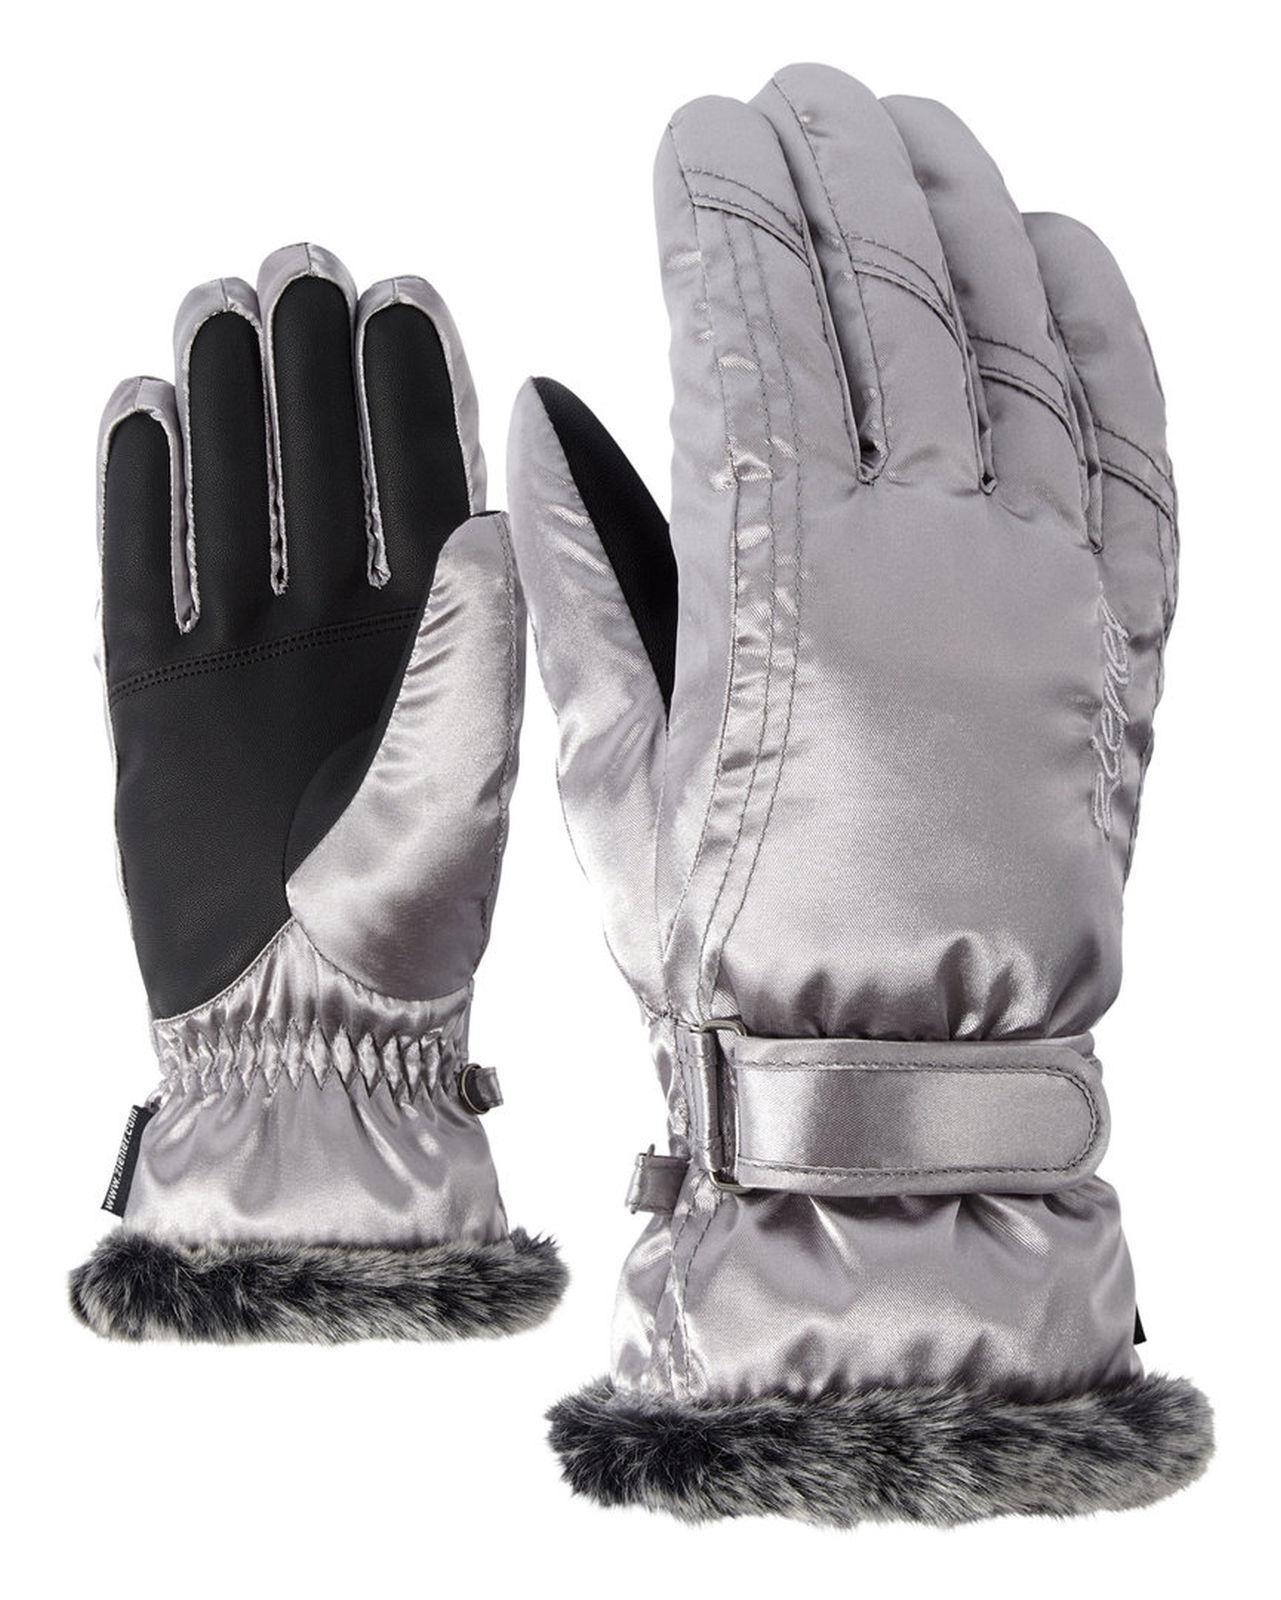 Ziener Damen Skihandschuhe Winterhandschuhe Kim Thermoshield silber 801117 166